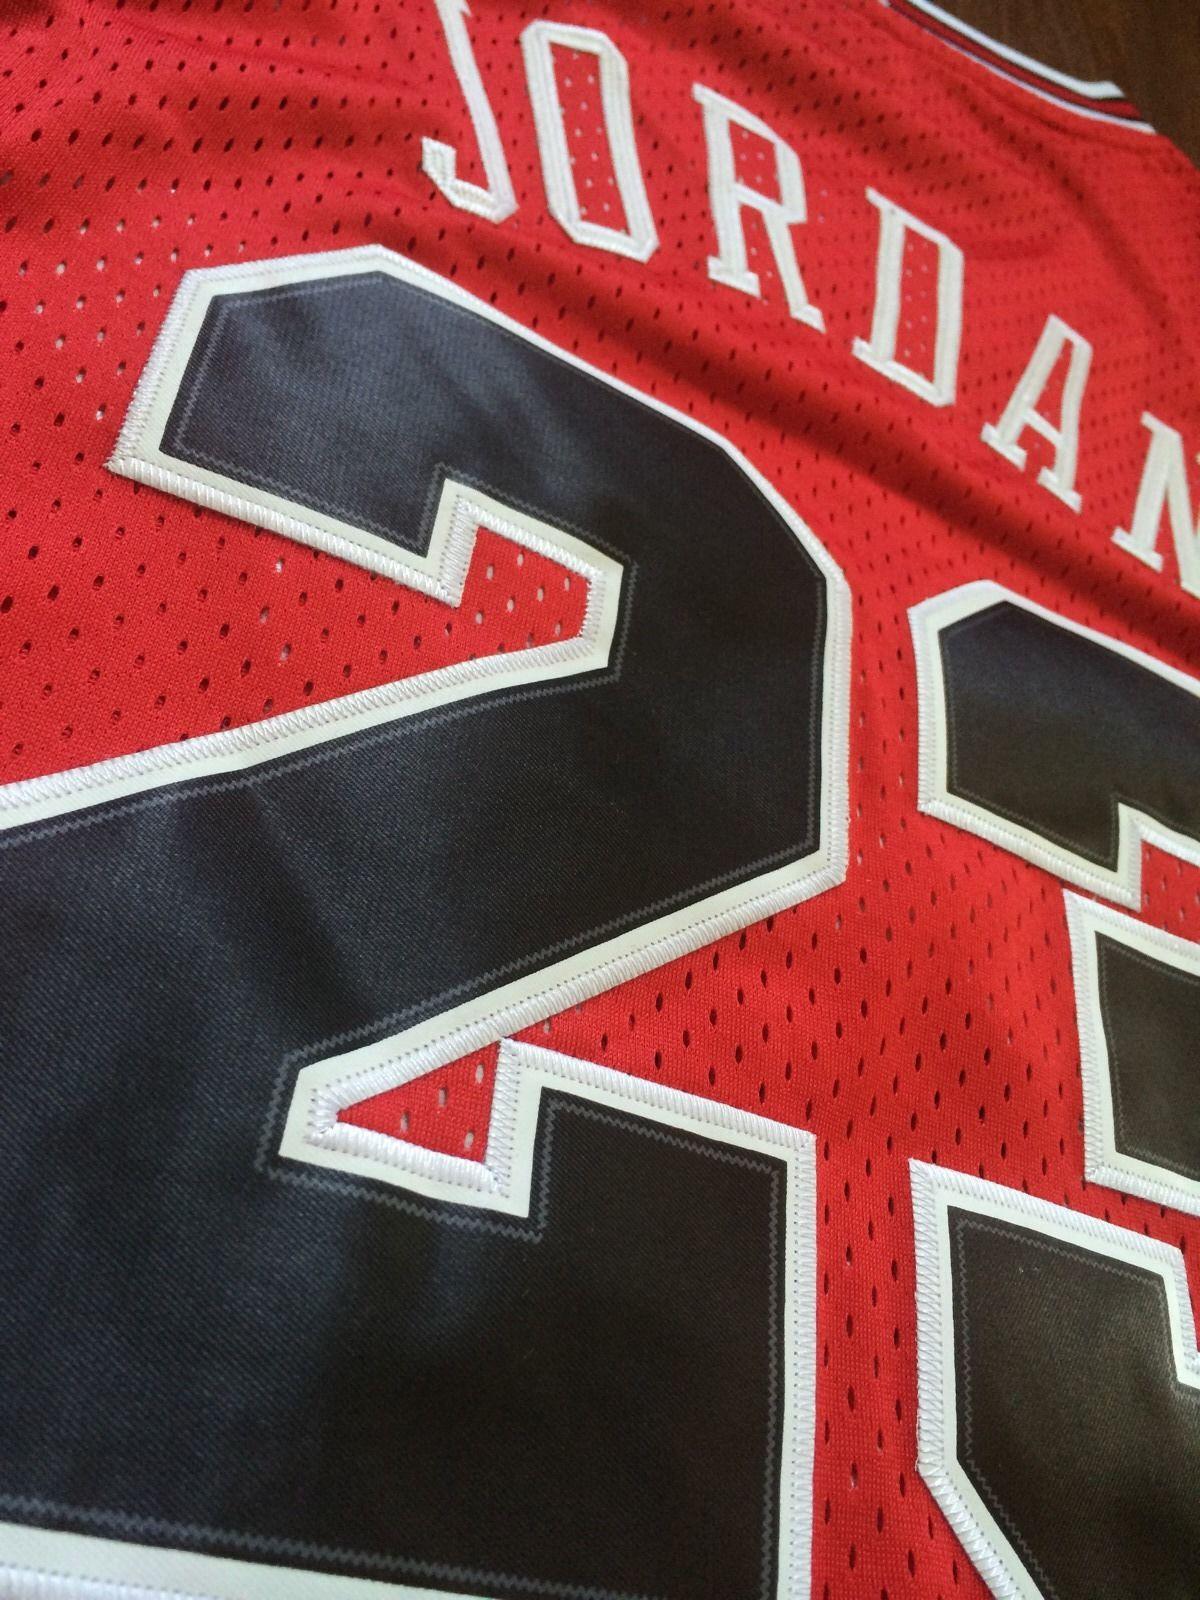 low priced 9a3ed 654ef Vintage Gear: Nike Michael Jordan Bulls Rookie Jersey - Air ...